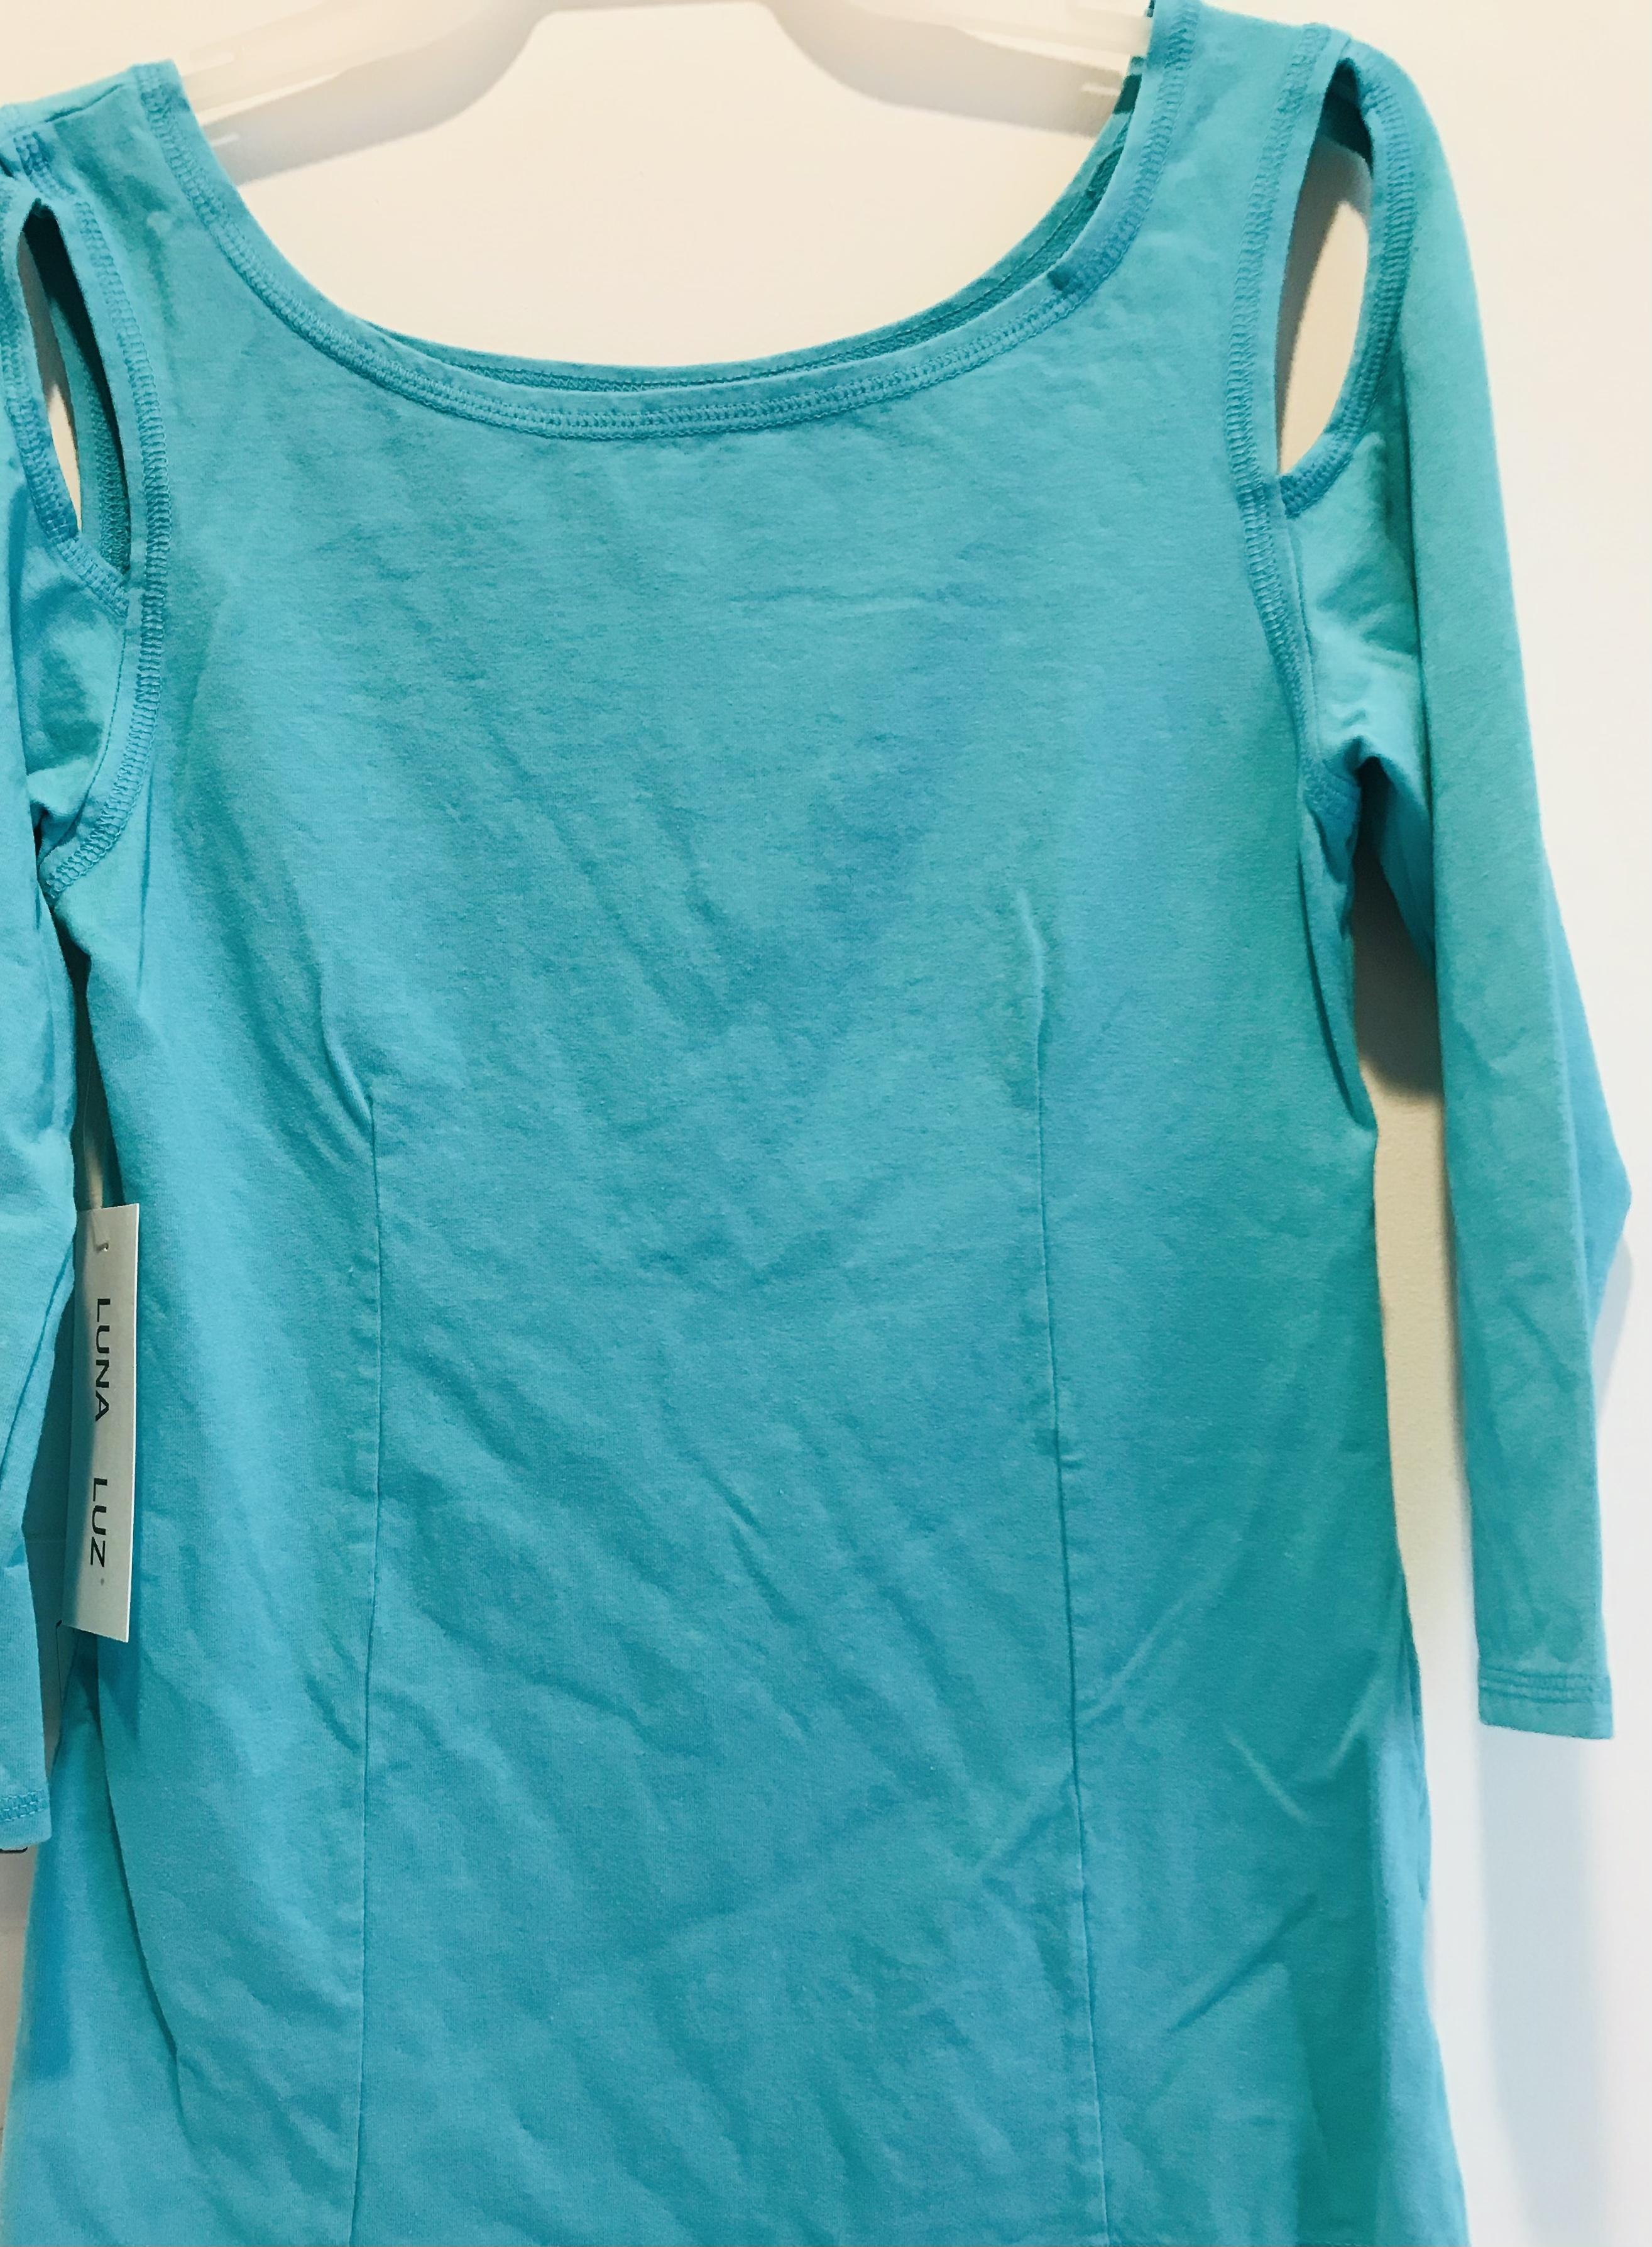 Luna Luz: Open Sleeve Cotton Top (Ships Immed in Angel Blue!)